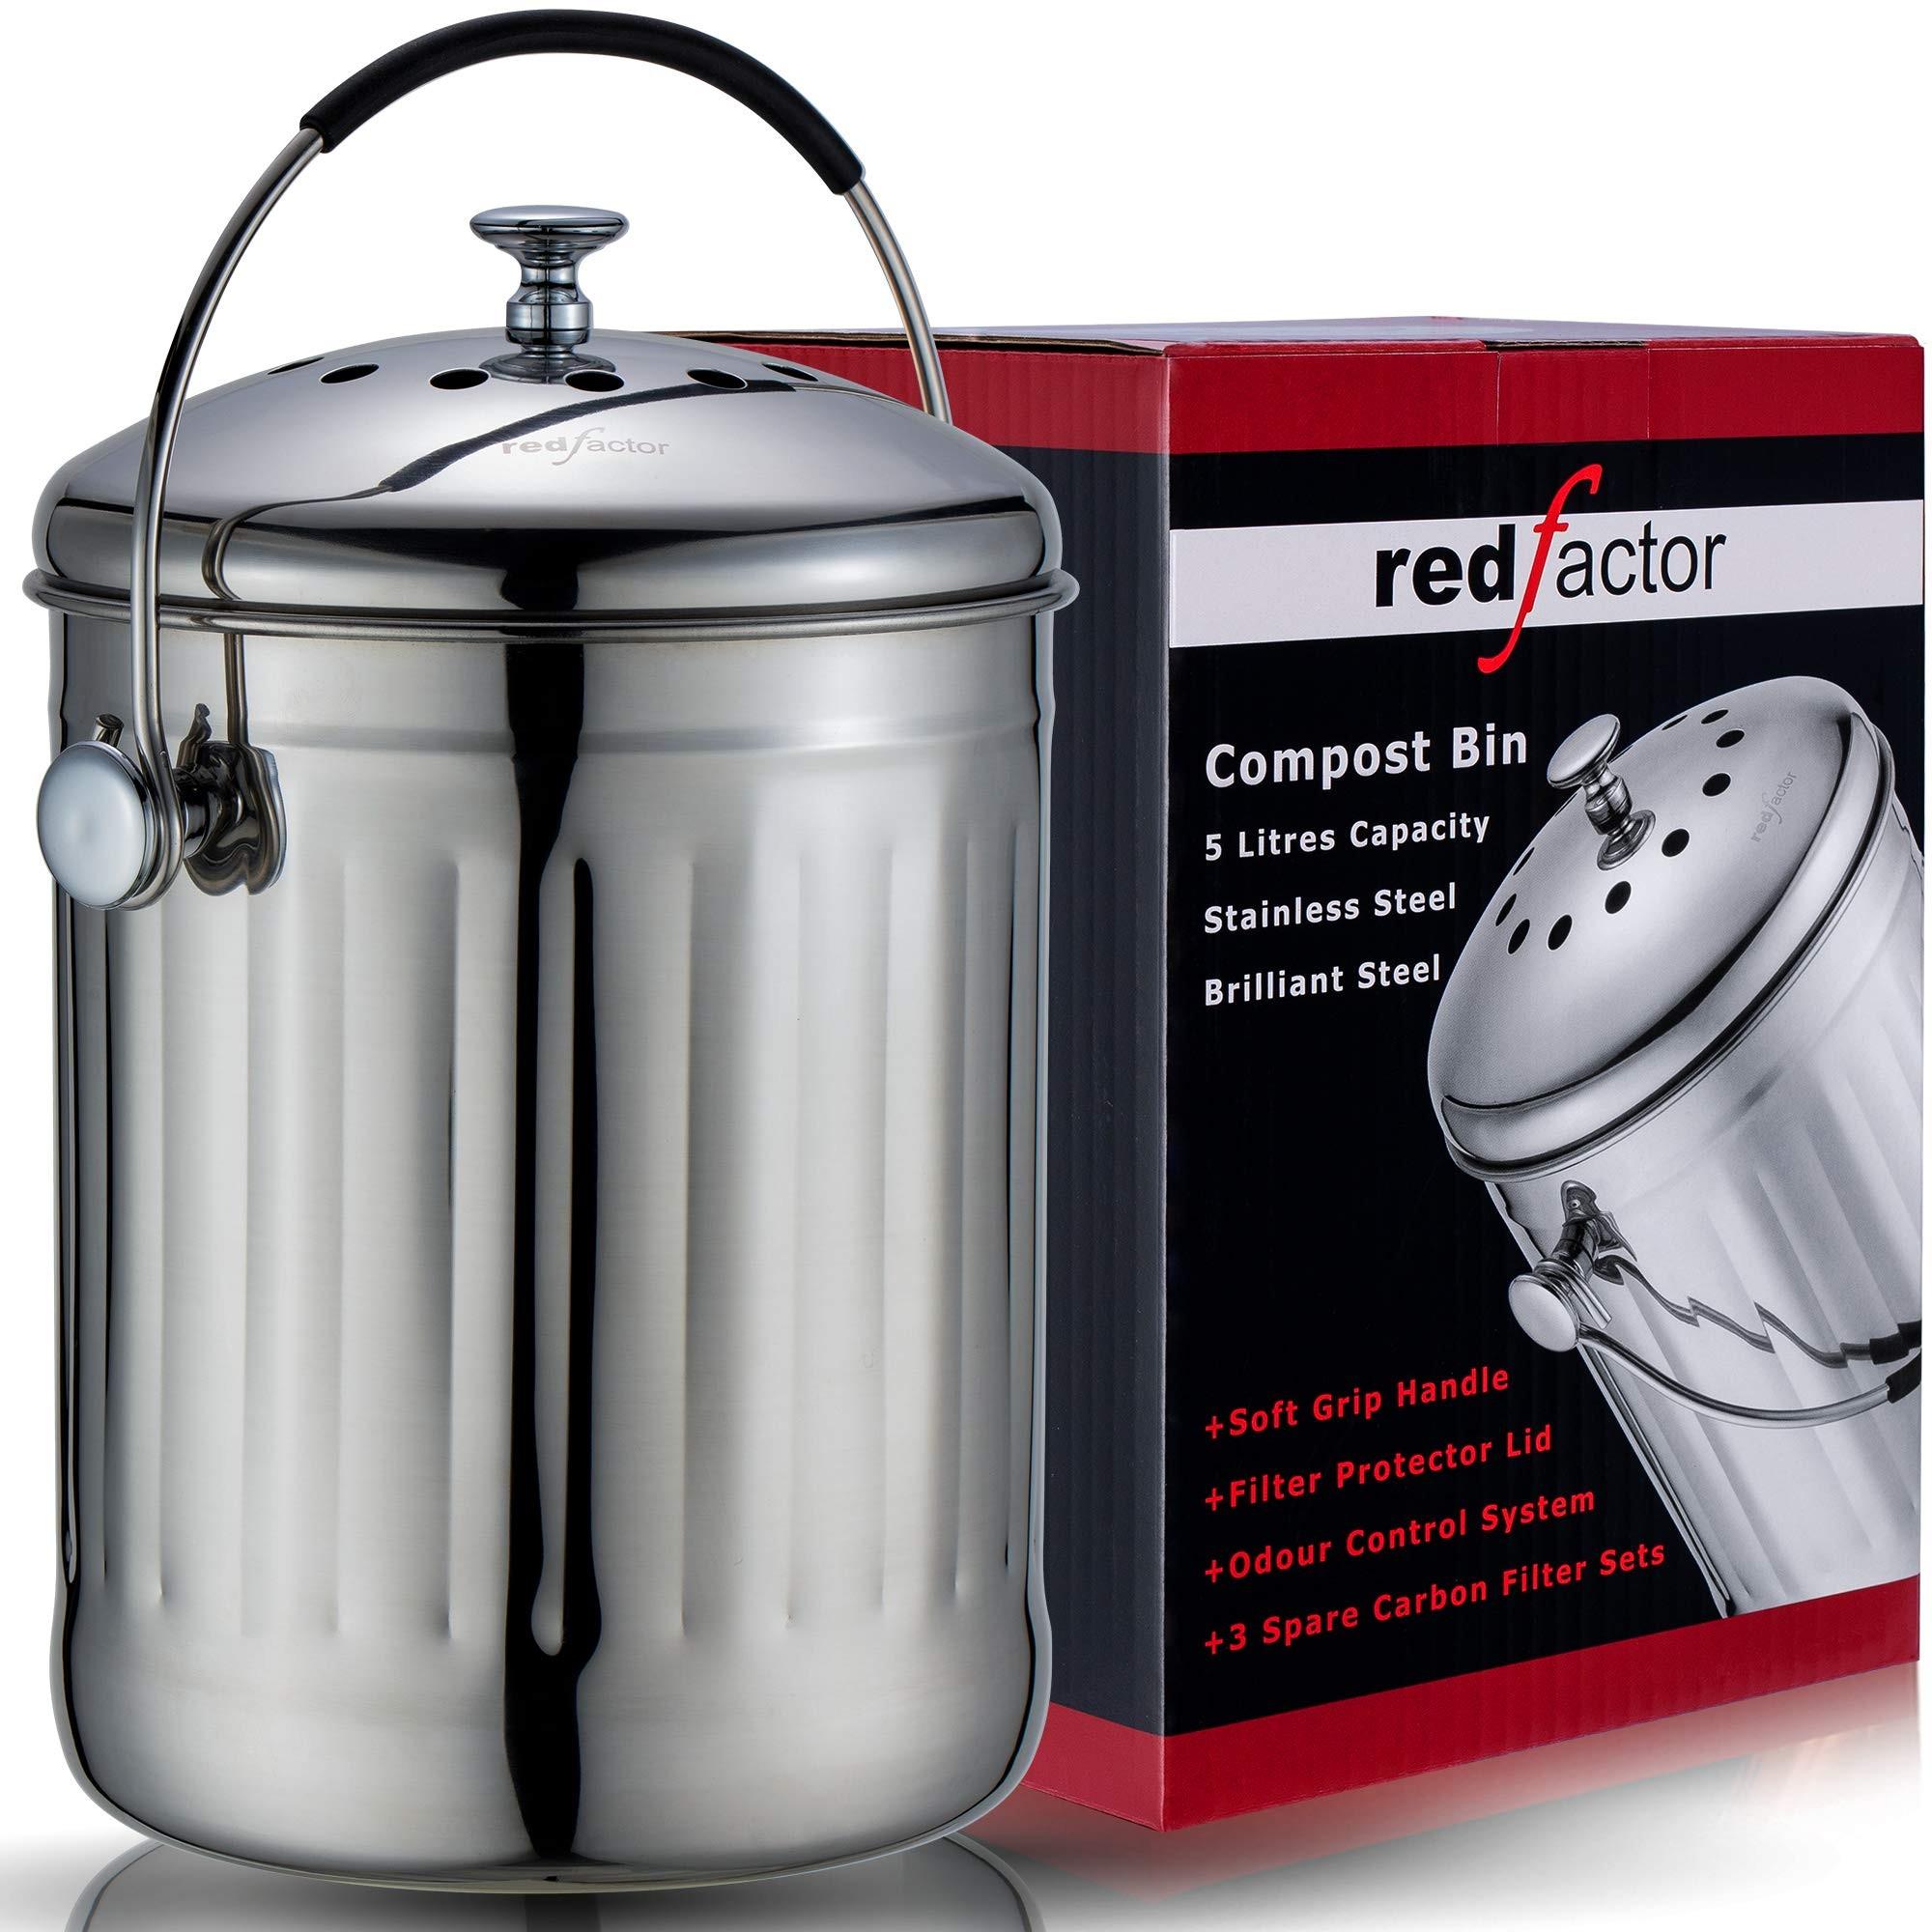 red countertop compost bin  RED FACTOR Premium Stainless Steel Odourless Compost Bin ..